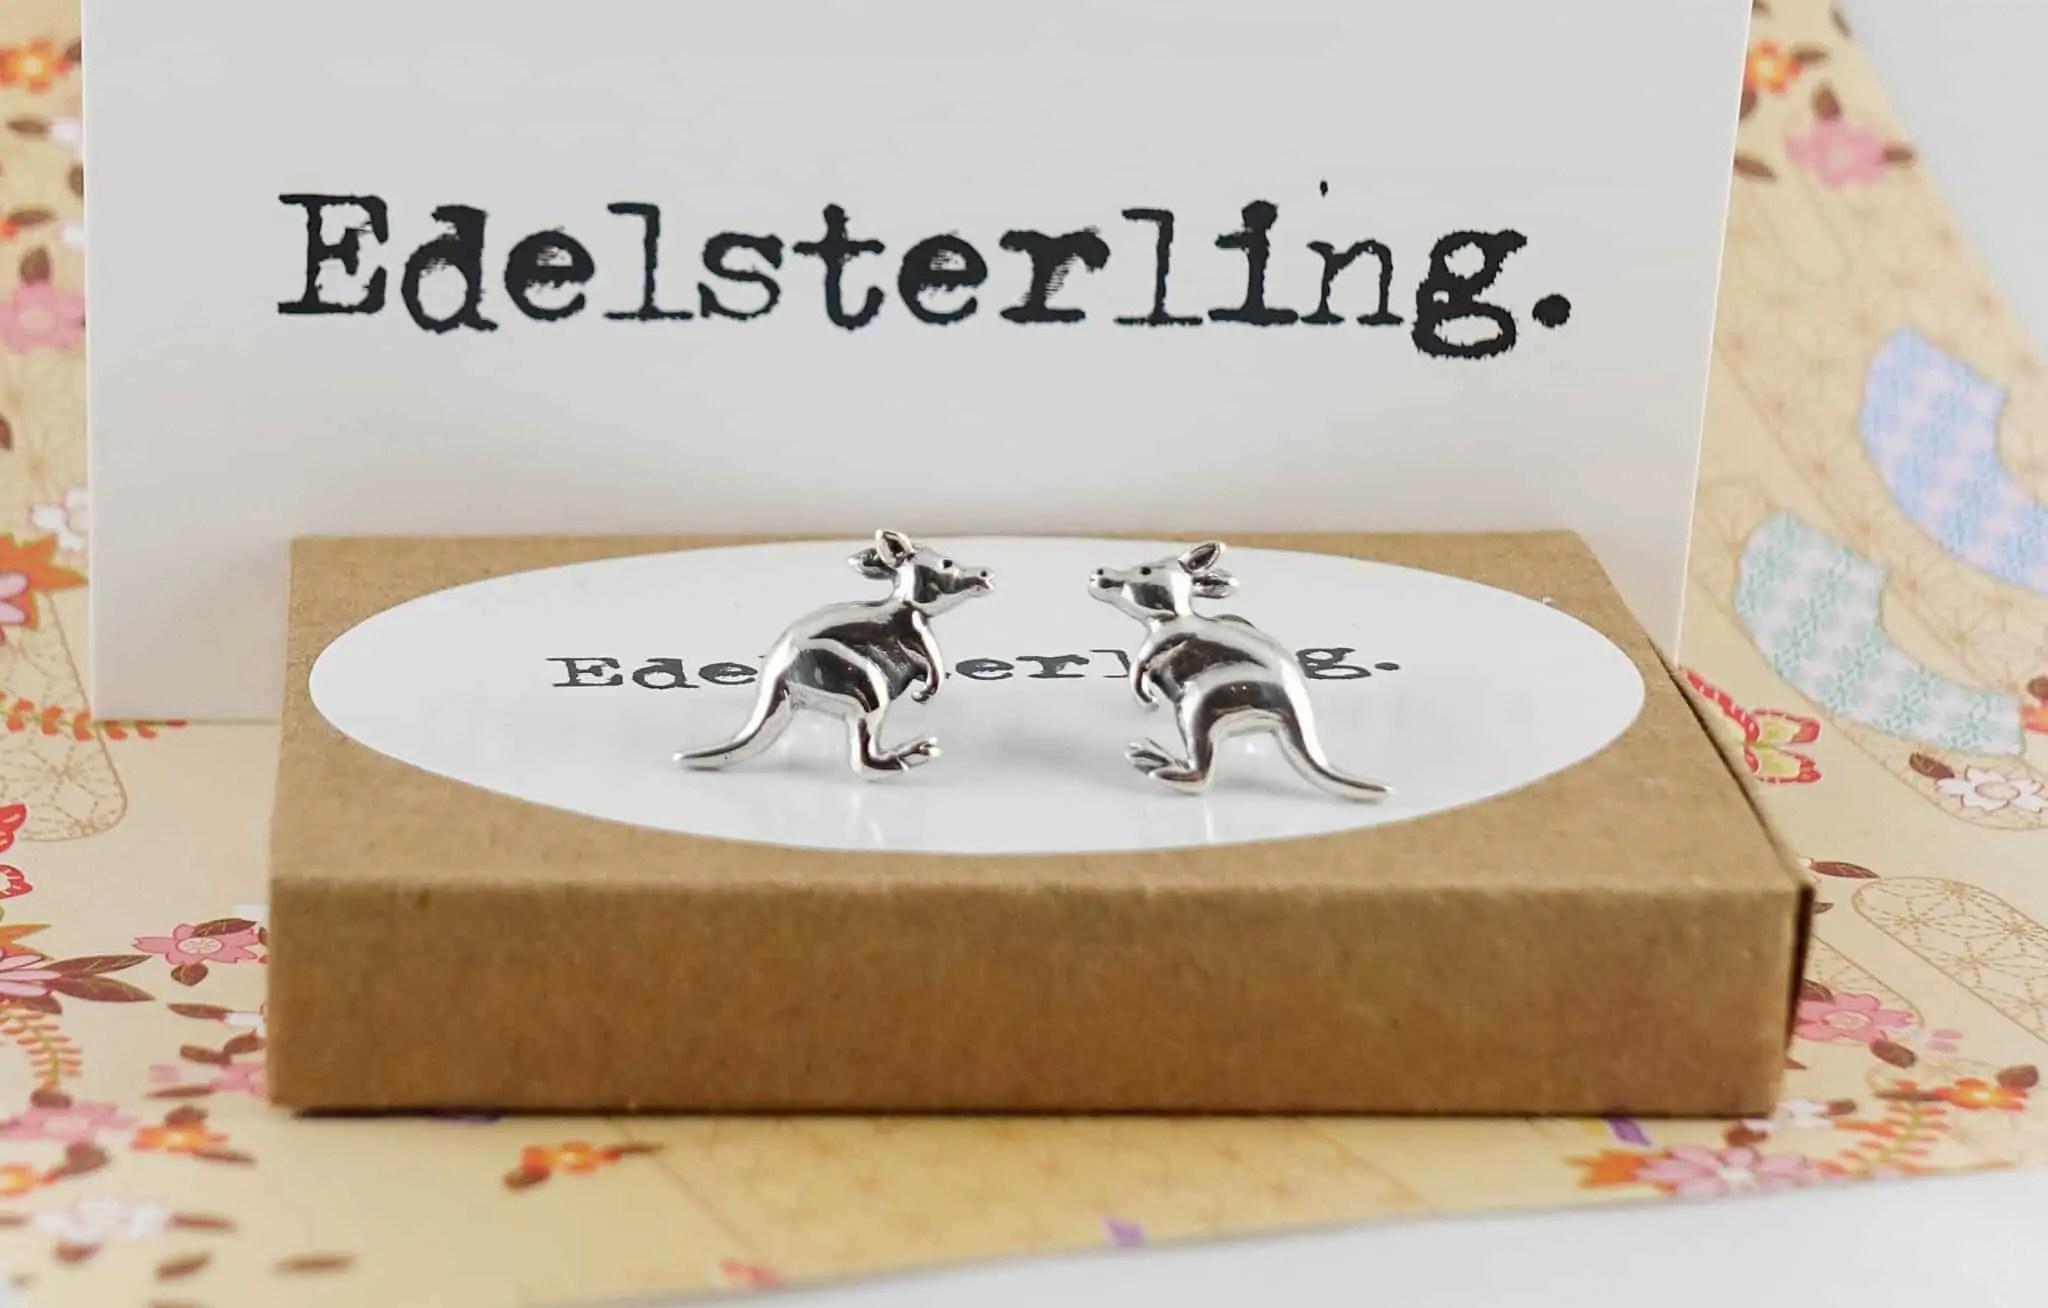 kangaroo stud earrings scaled Snazzy Trips